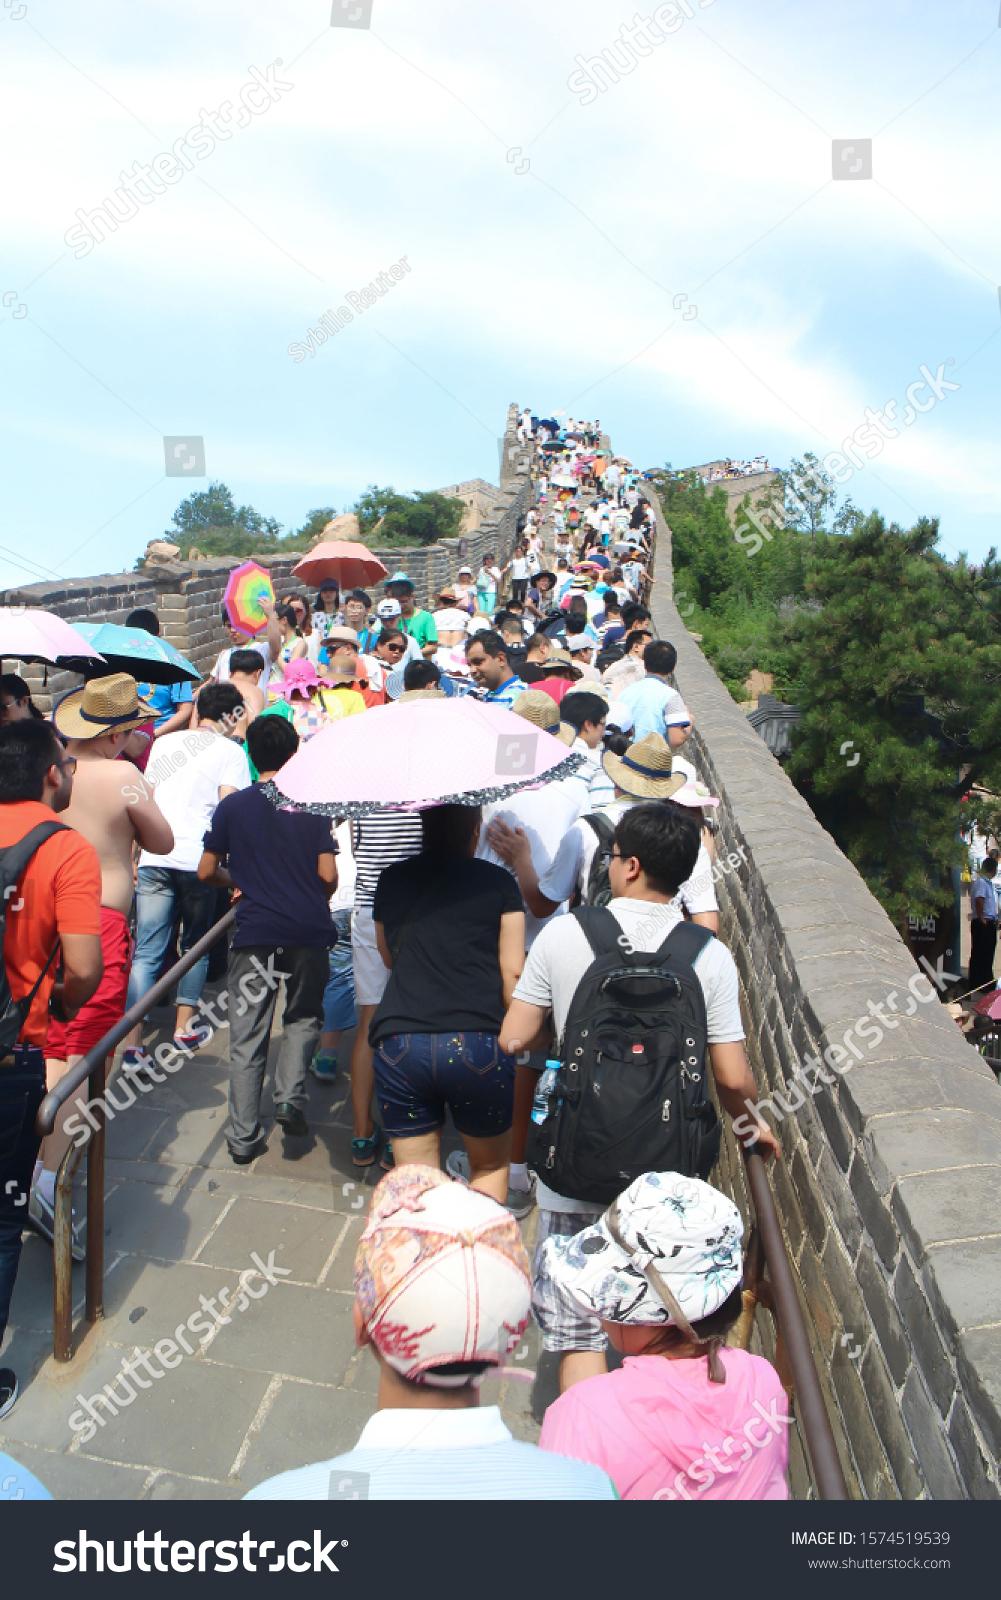 stock-photo-badaling-yanqing-district-be